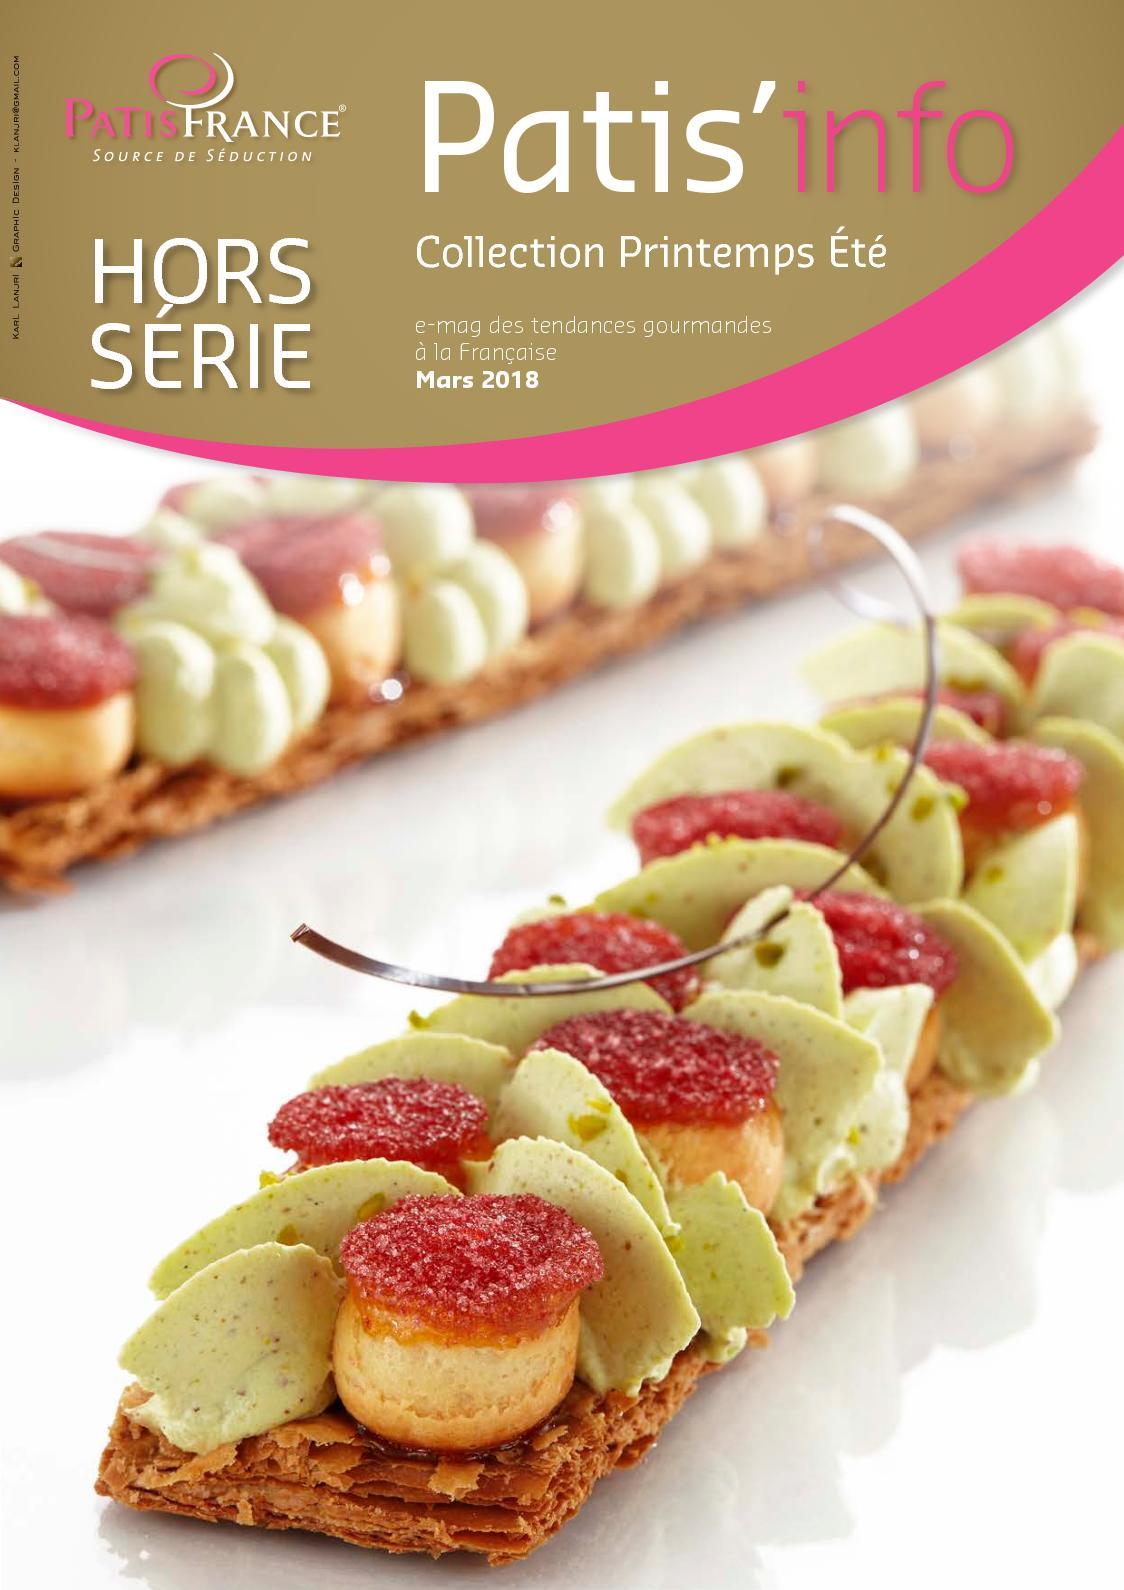 Patis'info Hors-Série Collection Printemps Eté Mars 2018 - CALAMEO